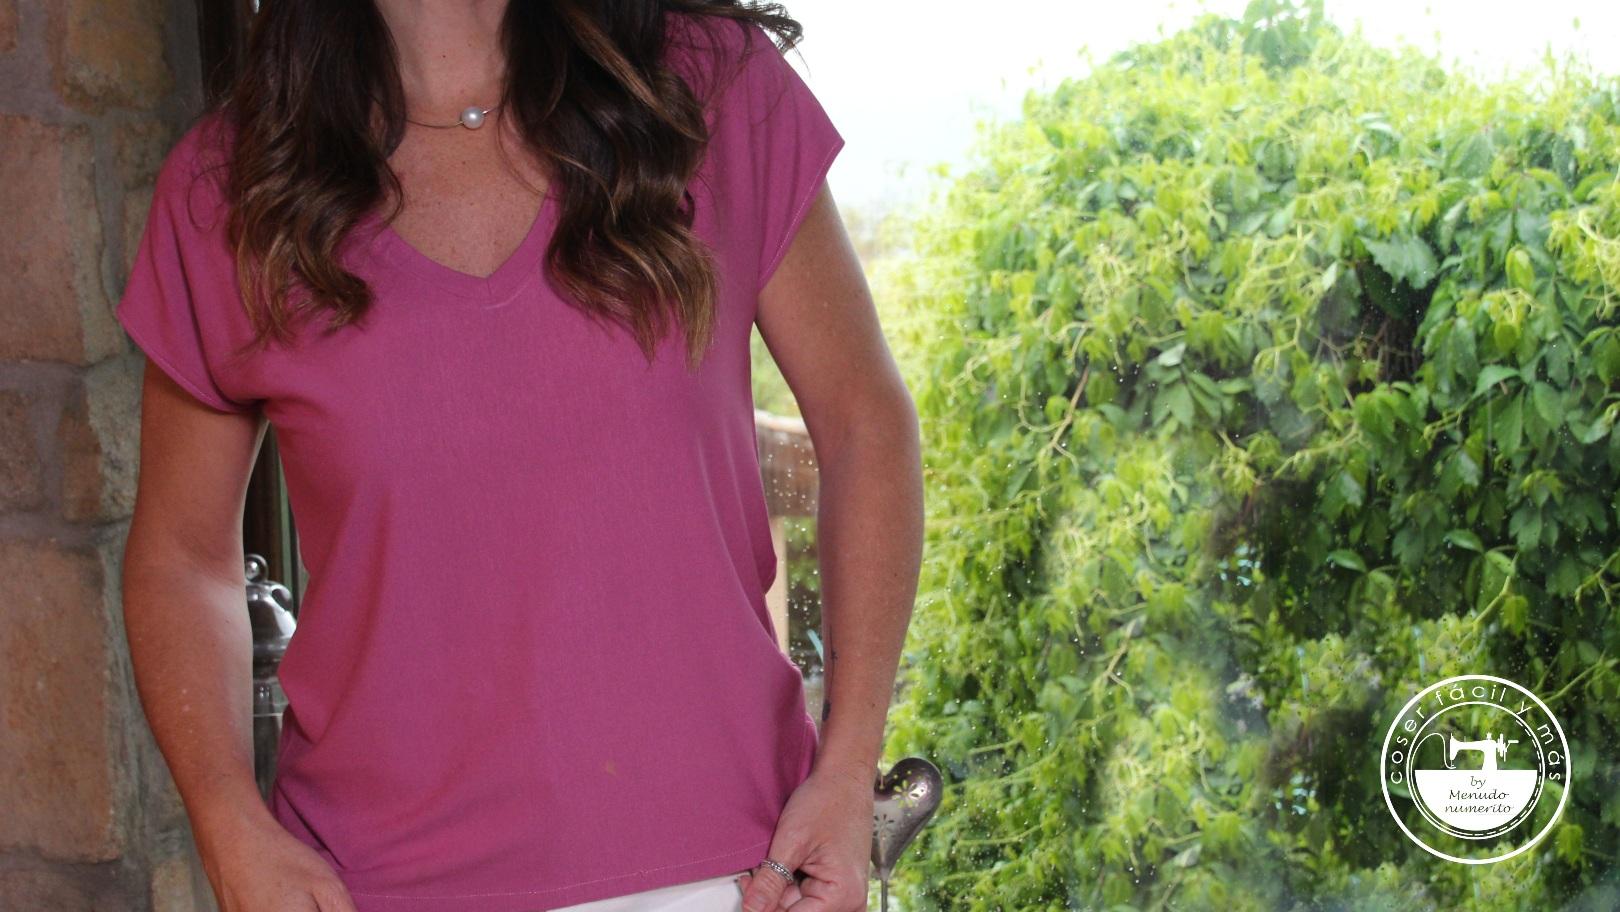 camiseta de punto tutorial blogs de costura menudo numerito